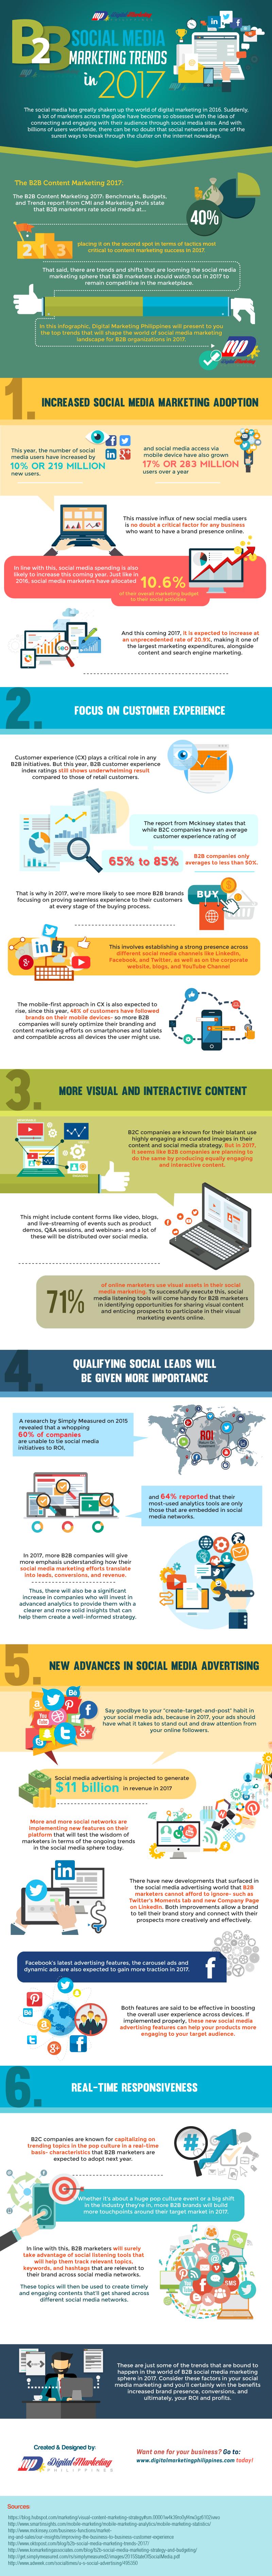 Creating a b2b digital marketing plan for 2017 infographic smart - 6 Hottest B2b Social Media Marketing Trends In 2017 Infographic Socialmedia Inbound